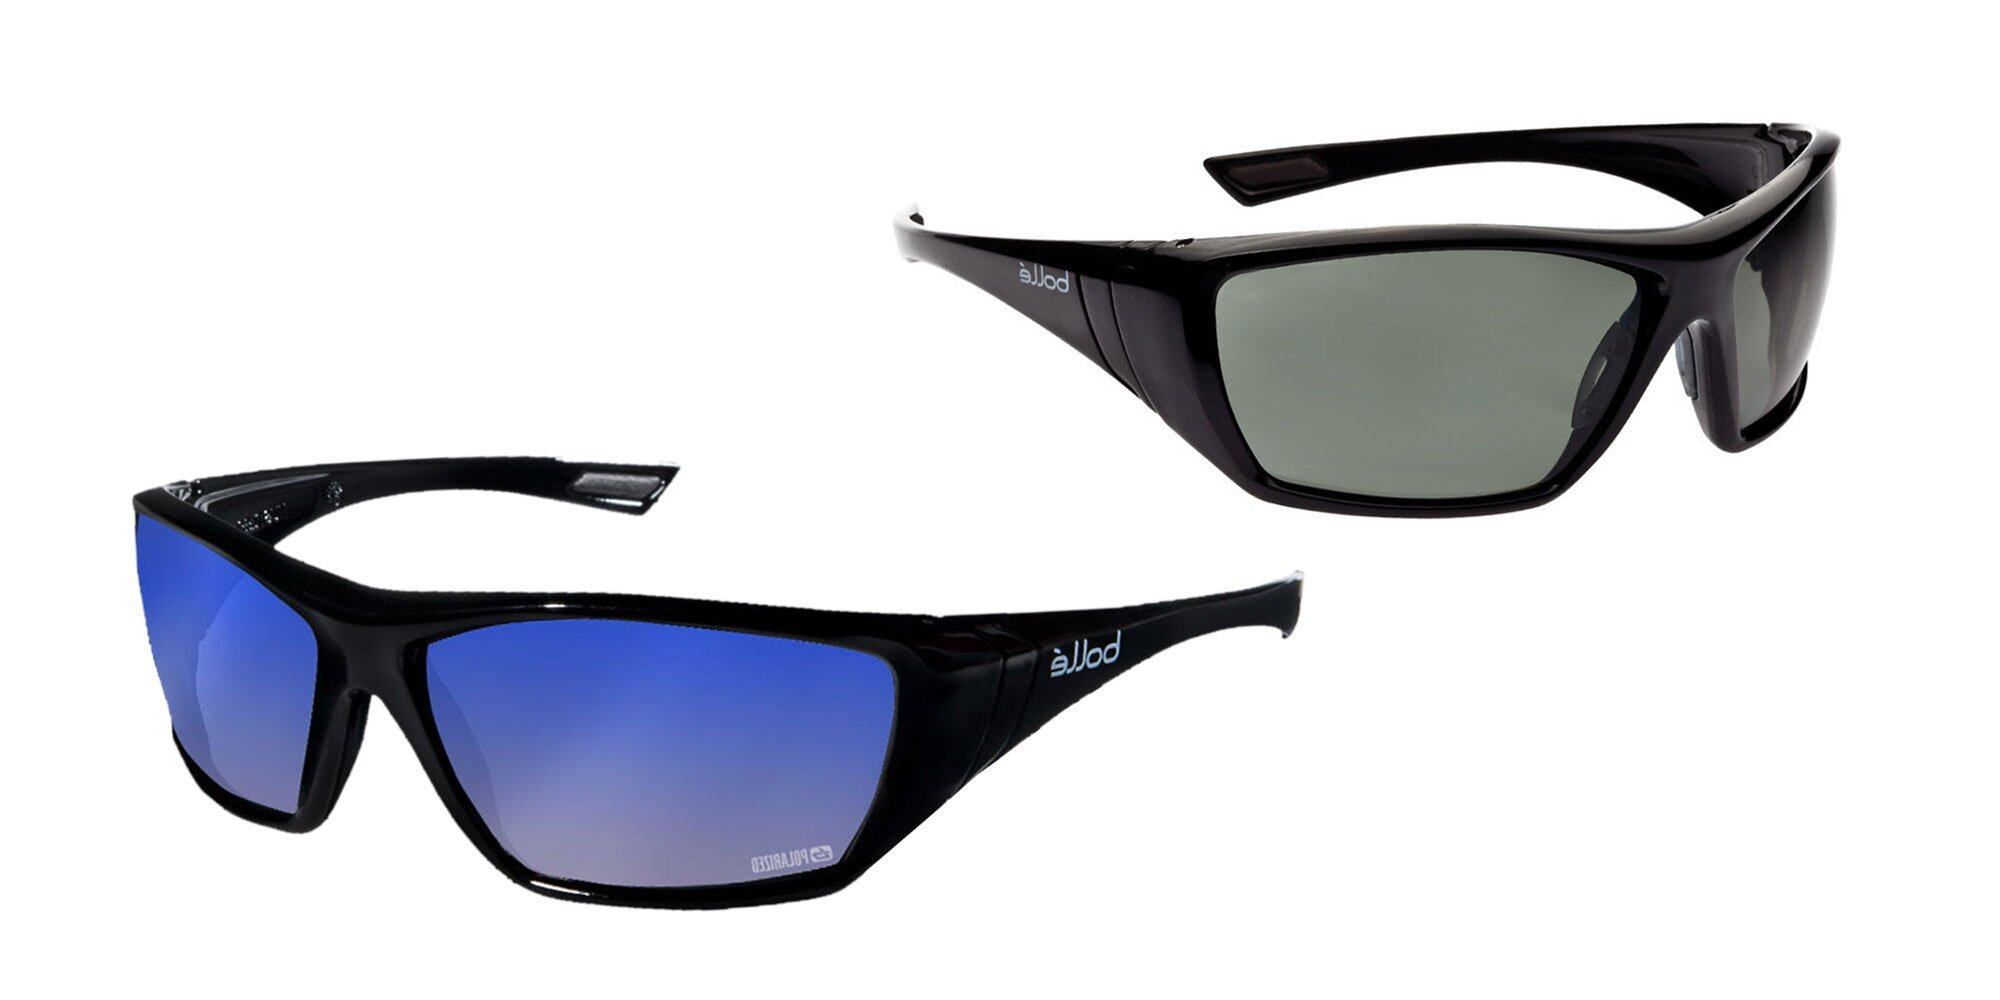 782d5d2da Trendové okuliare BOLLÉ HUSTLER a HUSTLER FLASH   Zlavomat.sk